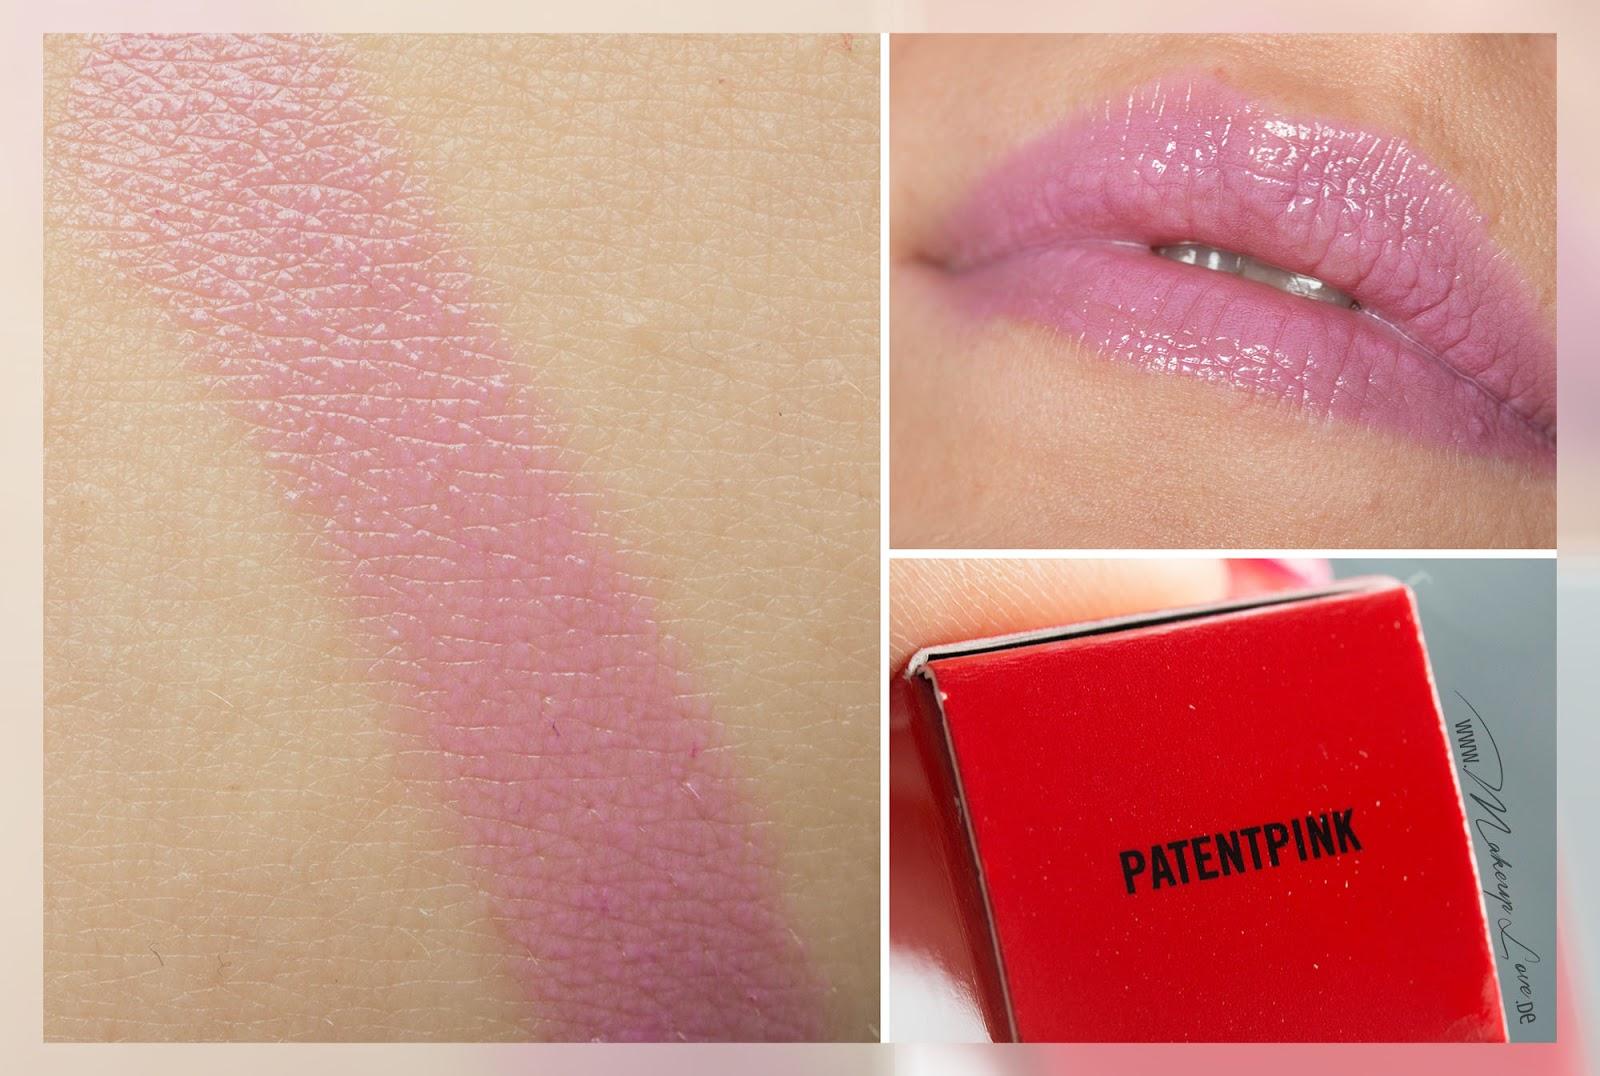 MAC Sharon Osbourne LE Patenpolish Lippencil Lippenstift Patentpink Swatch